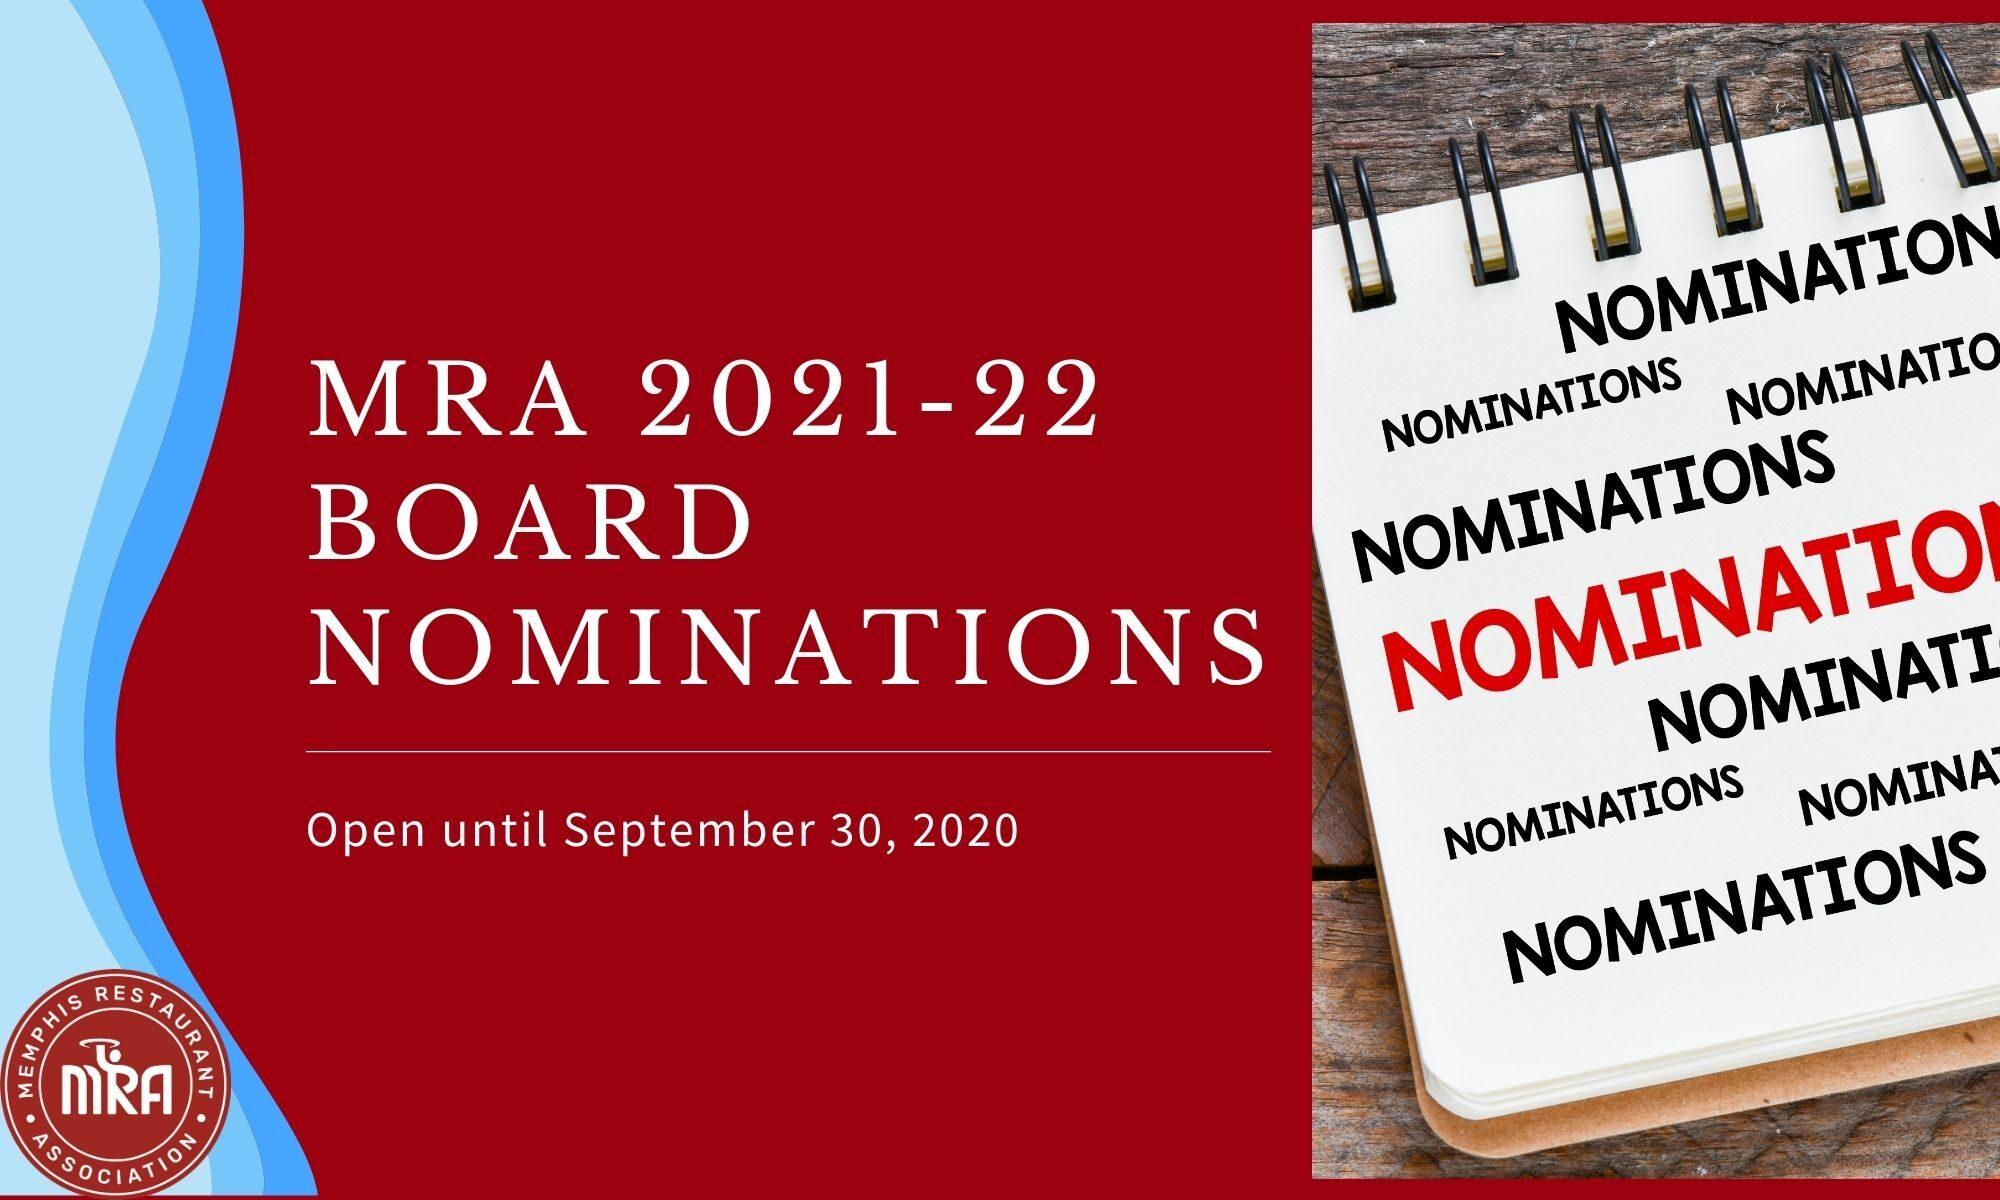 MRA Nominations Image